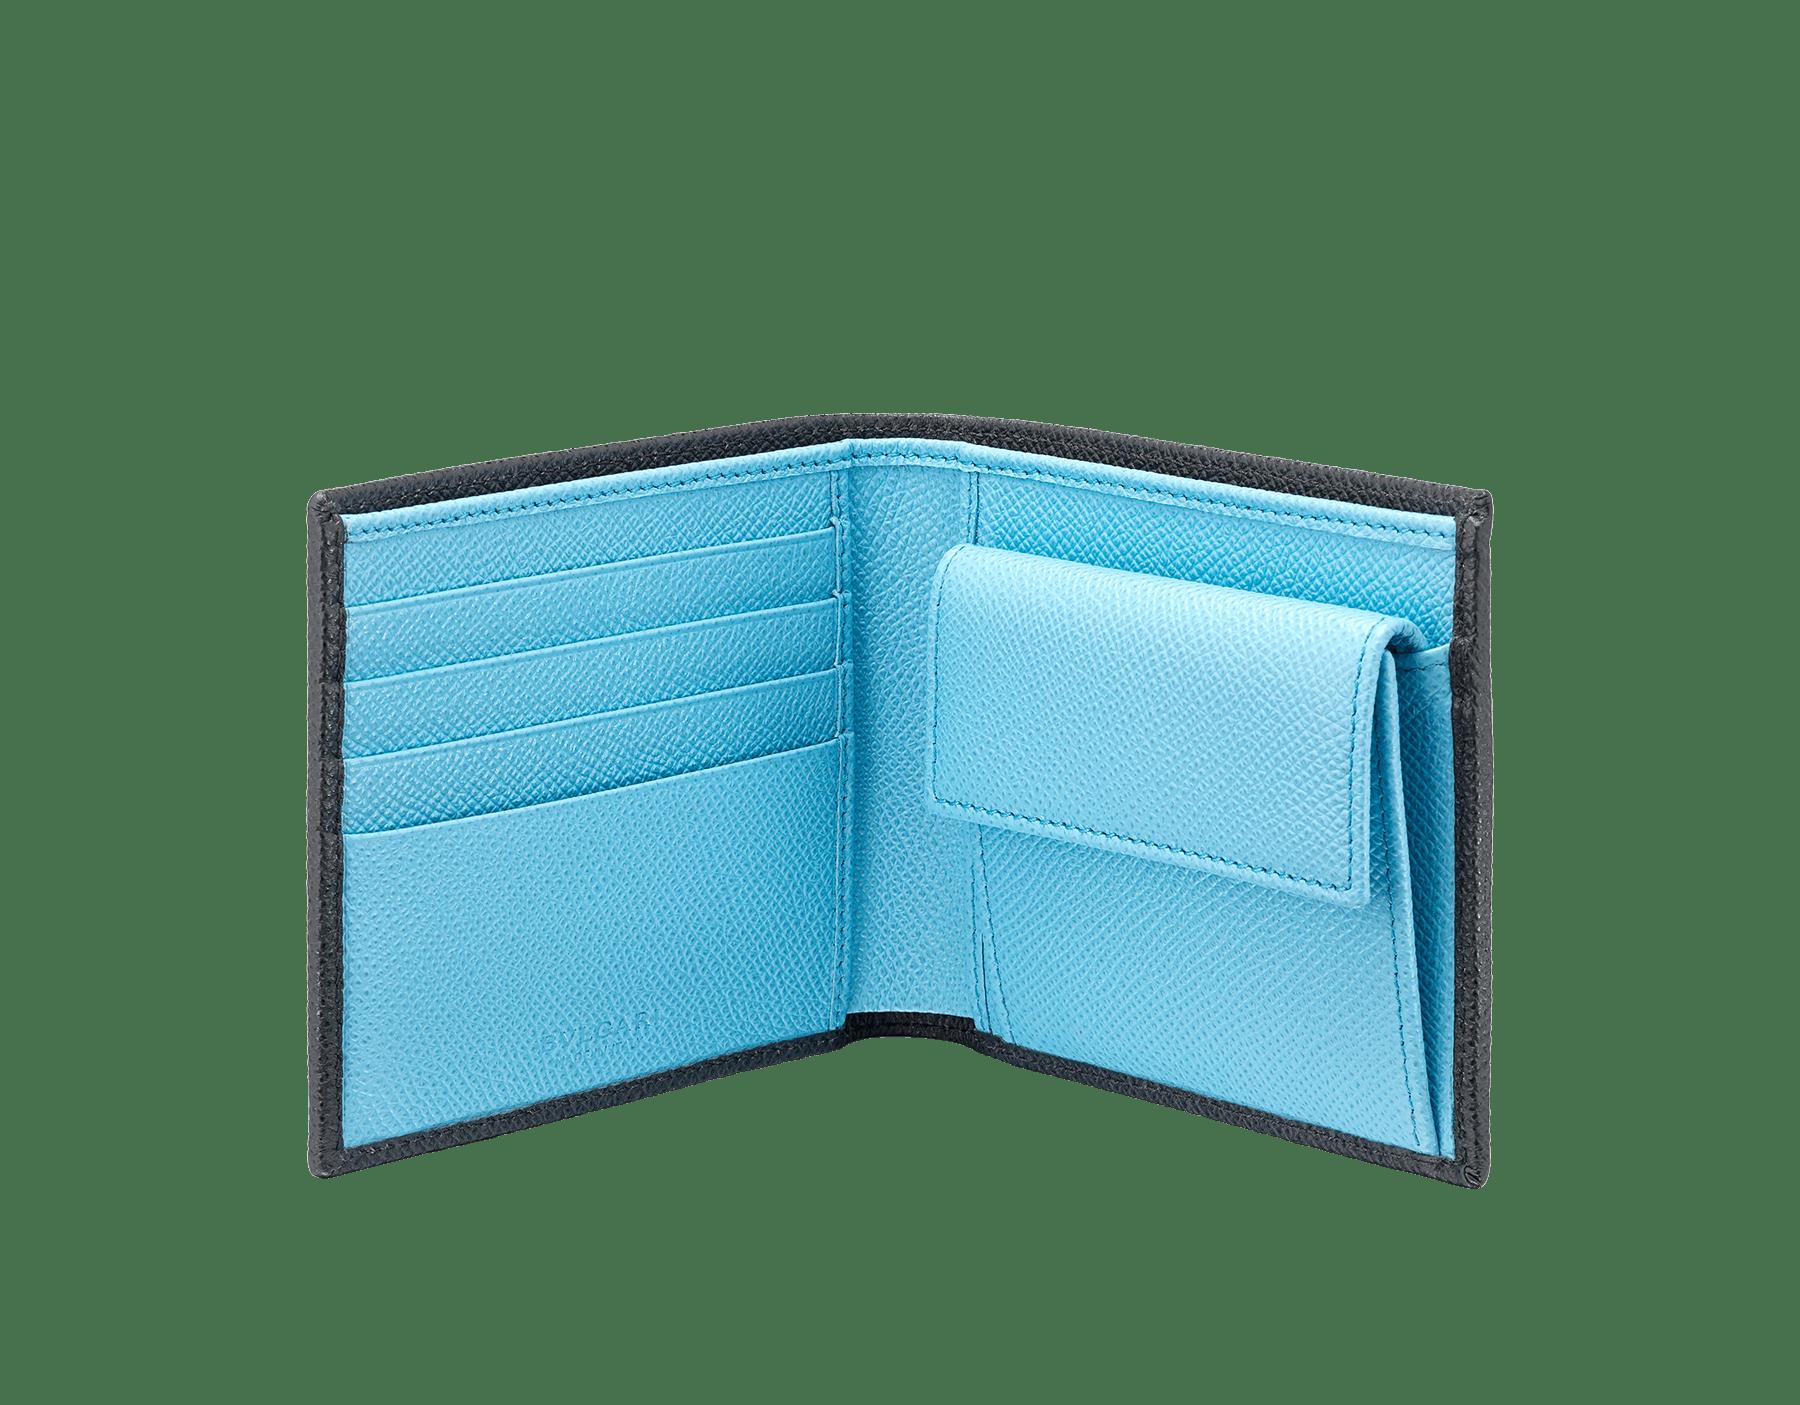 """BVLGARI BVLGARI"" compact wallet in Charcoal Diamond grey and light Aegean Topaz blue grained calfskin. Iconic logo-bearing embellishment in palladium-plated brass. 290587 image 2"